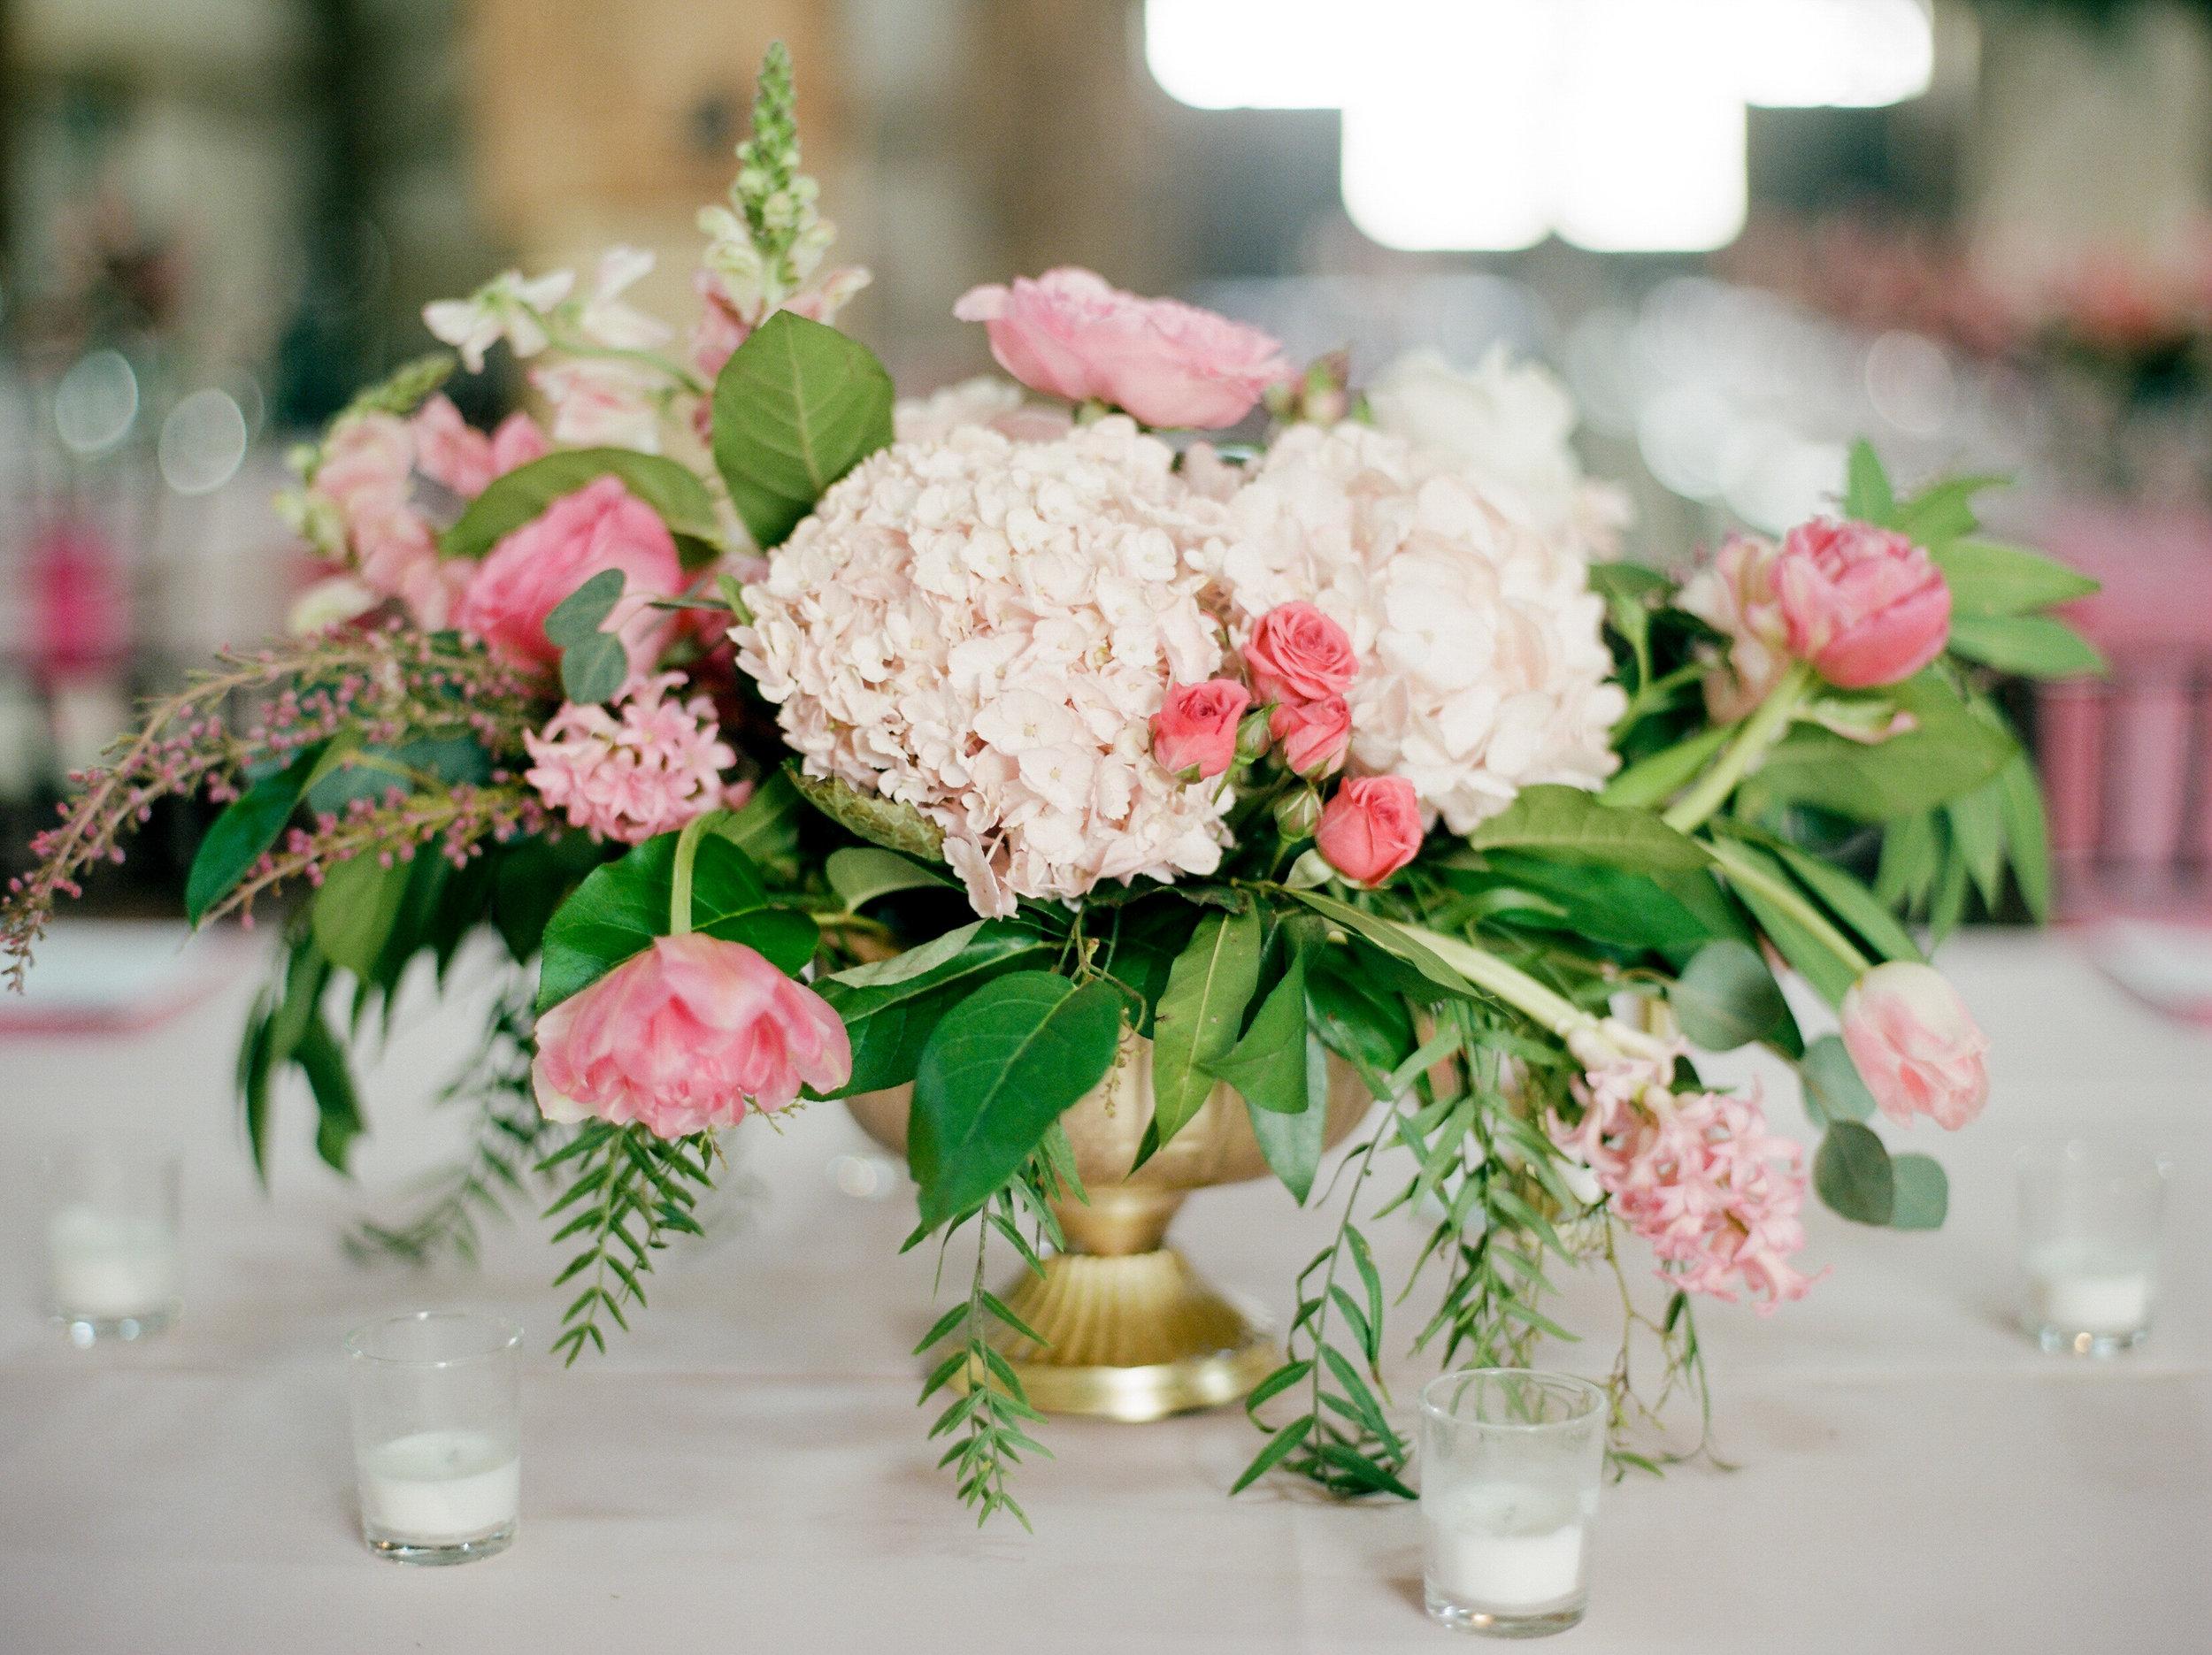 The-Knot-50-Weddings-50-States-Texas-Winner-Dana-Fernandez-photography-houston-wedding-photographer-film-fine-art-destination-36.jpg